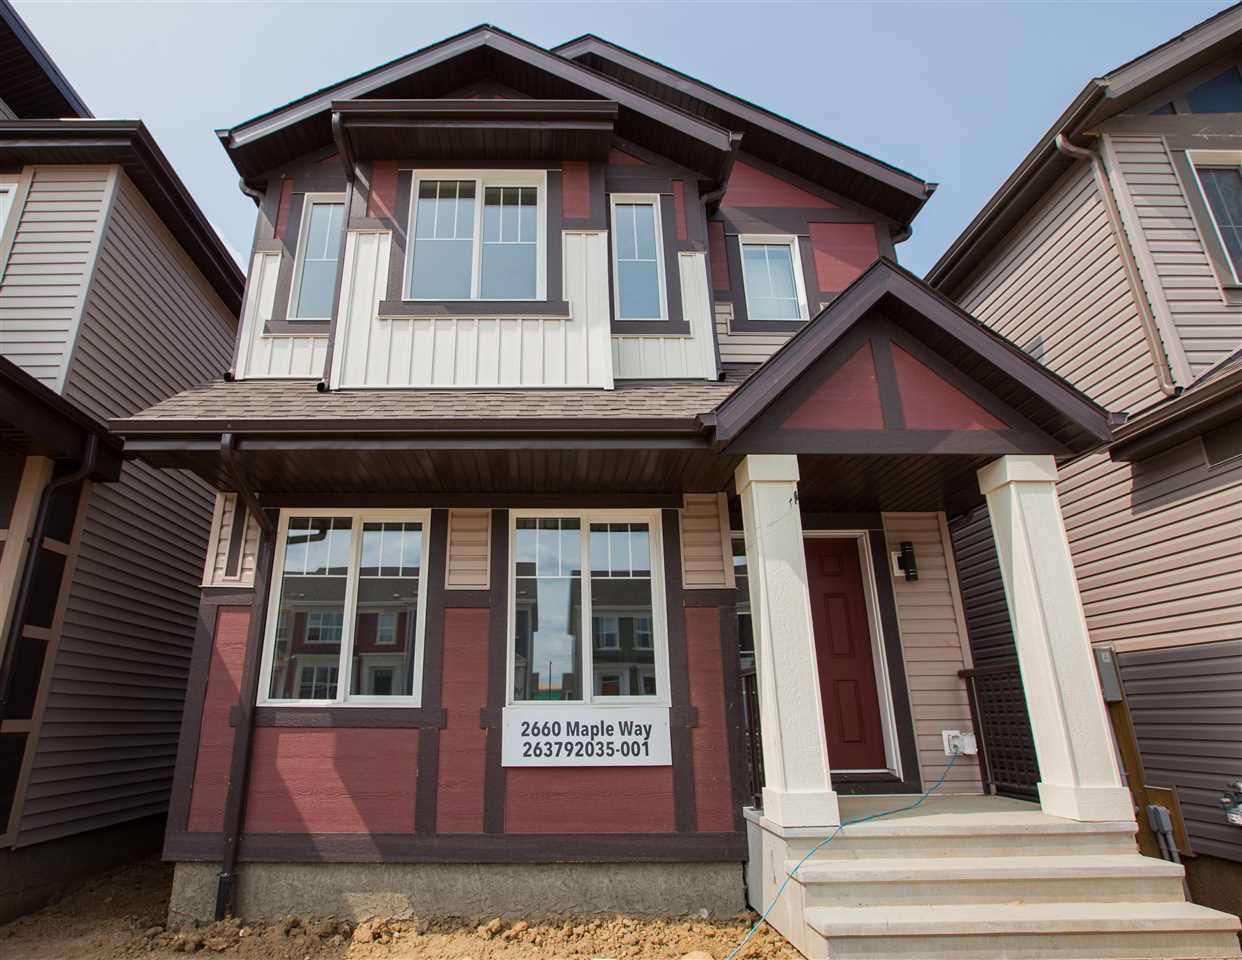 Main Photo: 2660 MAPLE Way in Edmonton: Zone 30 House for sale : MLS®# E4139352